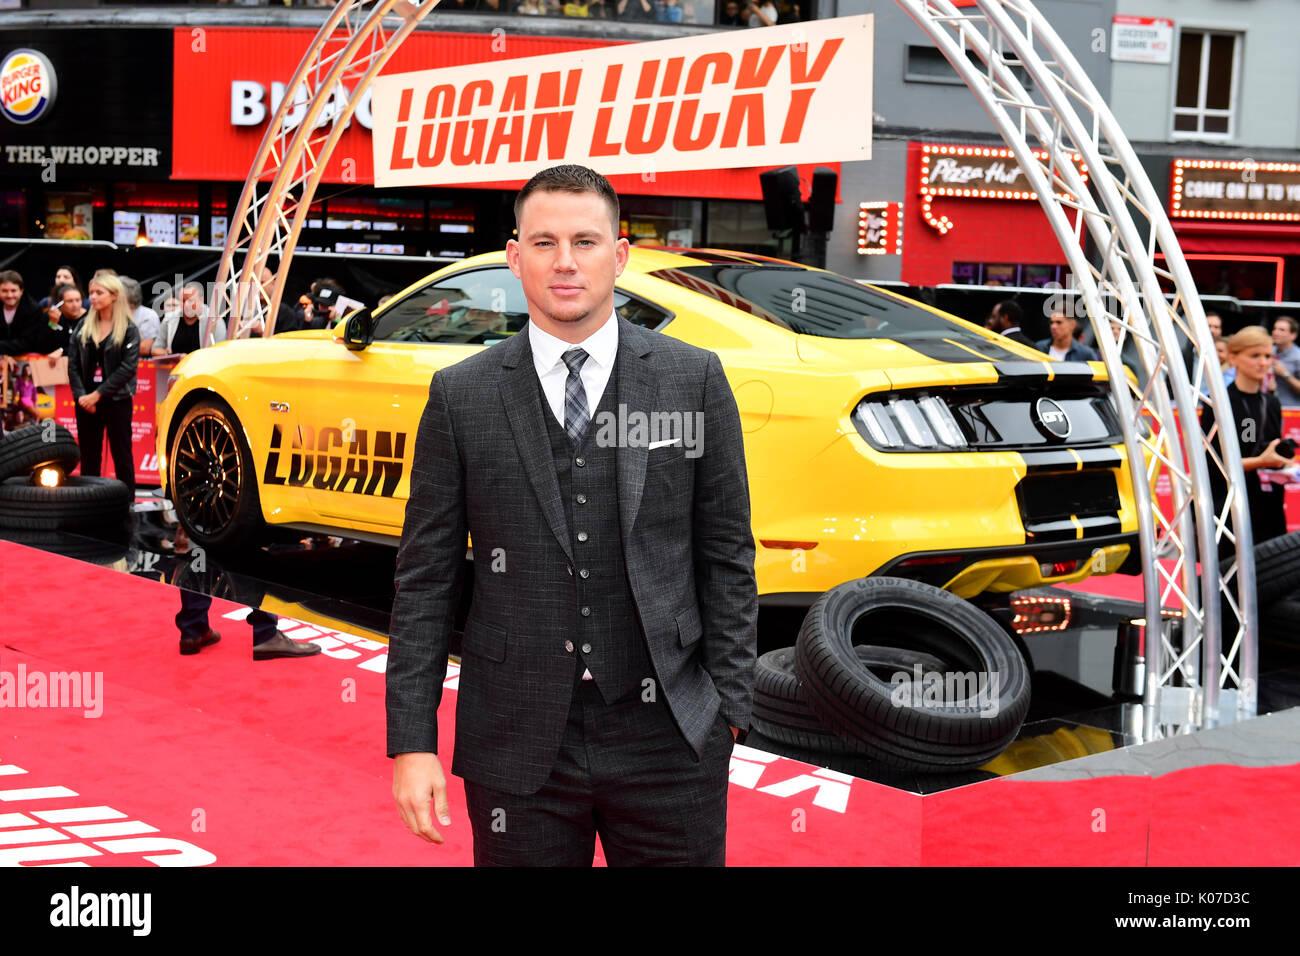 Channing Tatum participando do Logan Lucky UK Premiere realizada no Vue West End em Leicester Square, Londres. Imagens de Stock